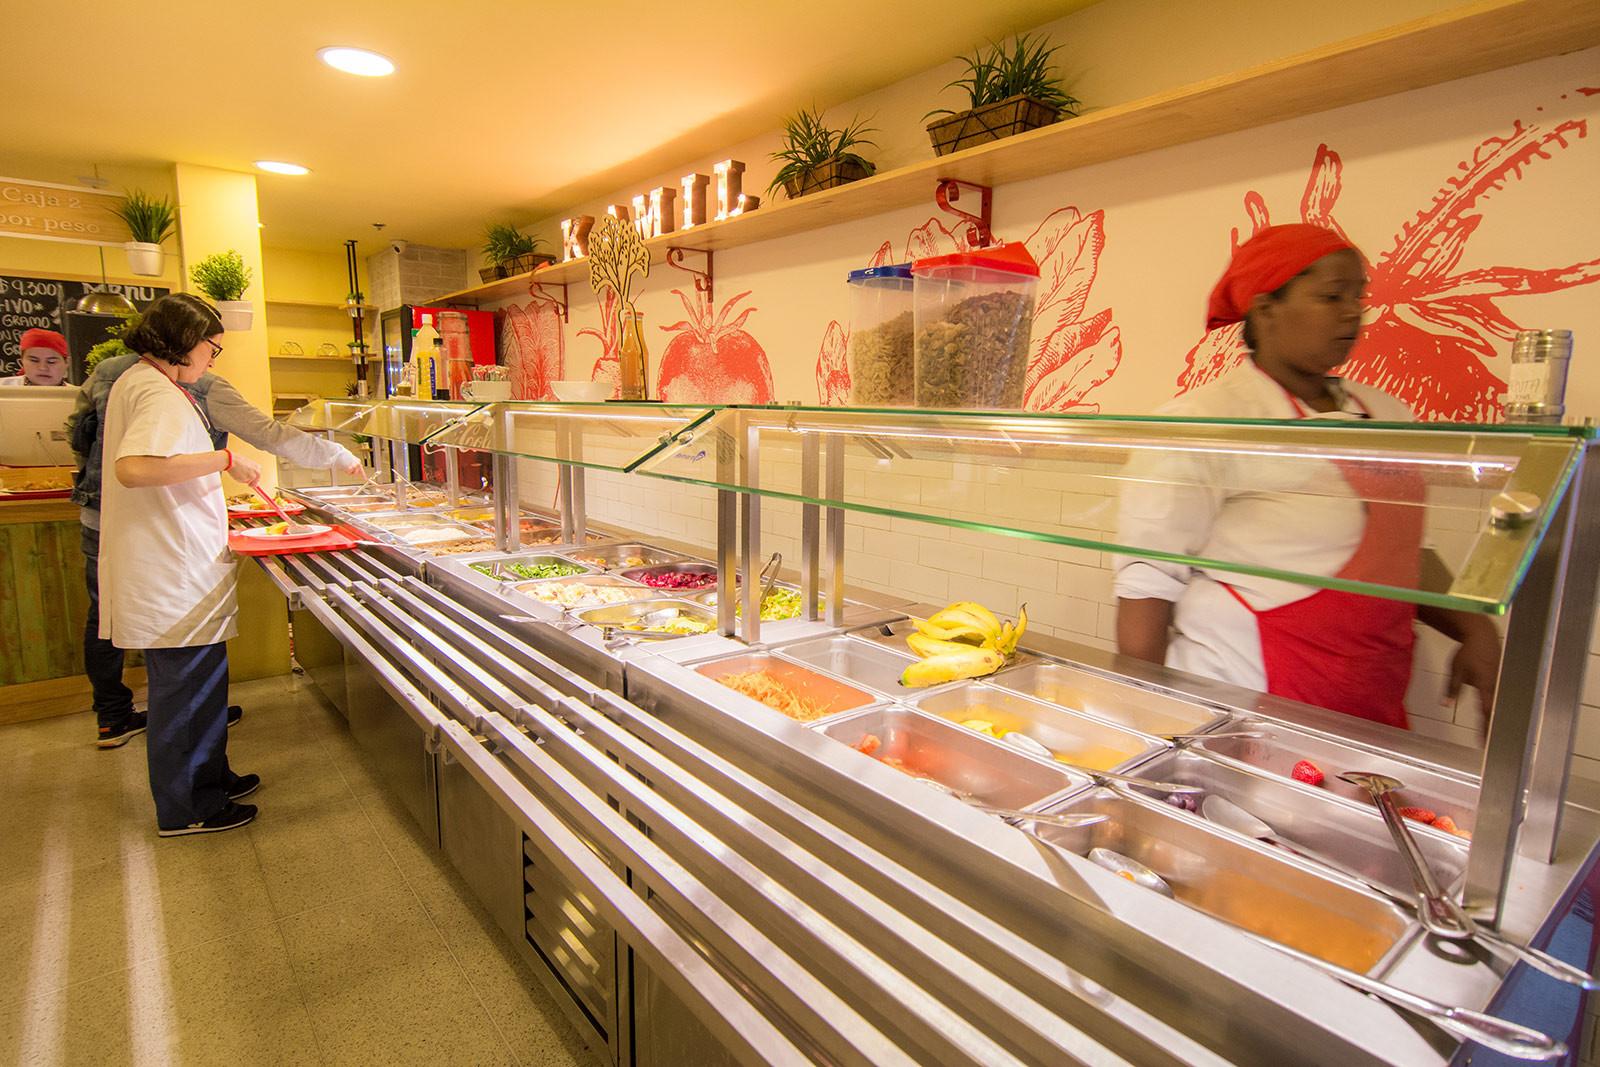 kamil-hptu-hospital-medellin-restaurante